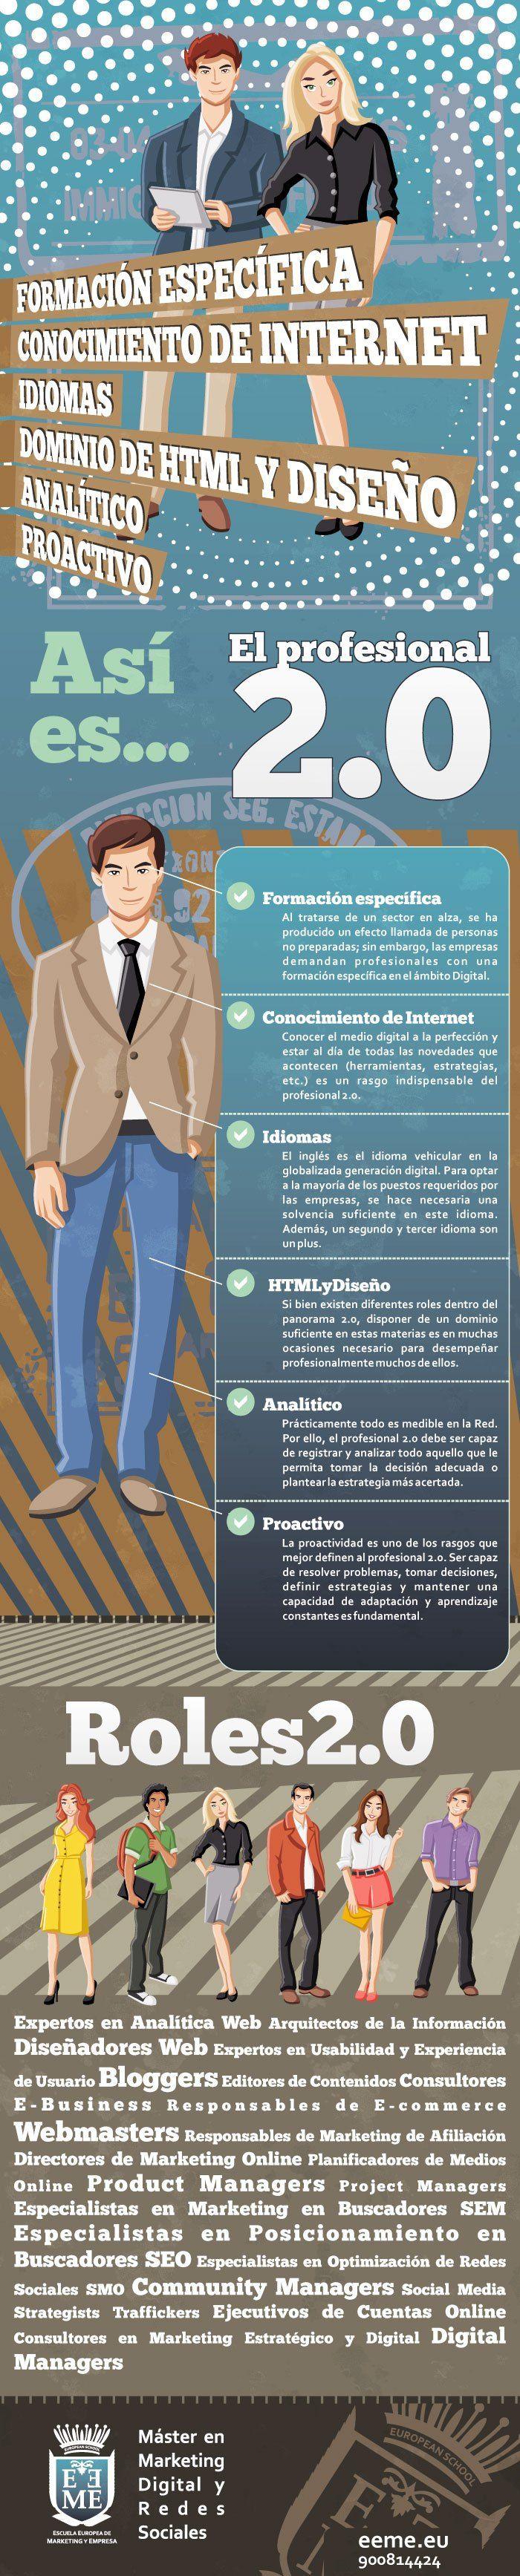 Así es el Profesional 2.0 #infografia #infographic #socialmedia #marketing